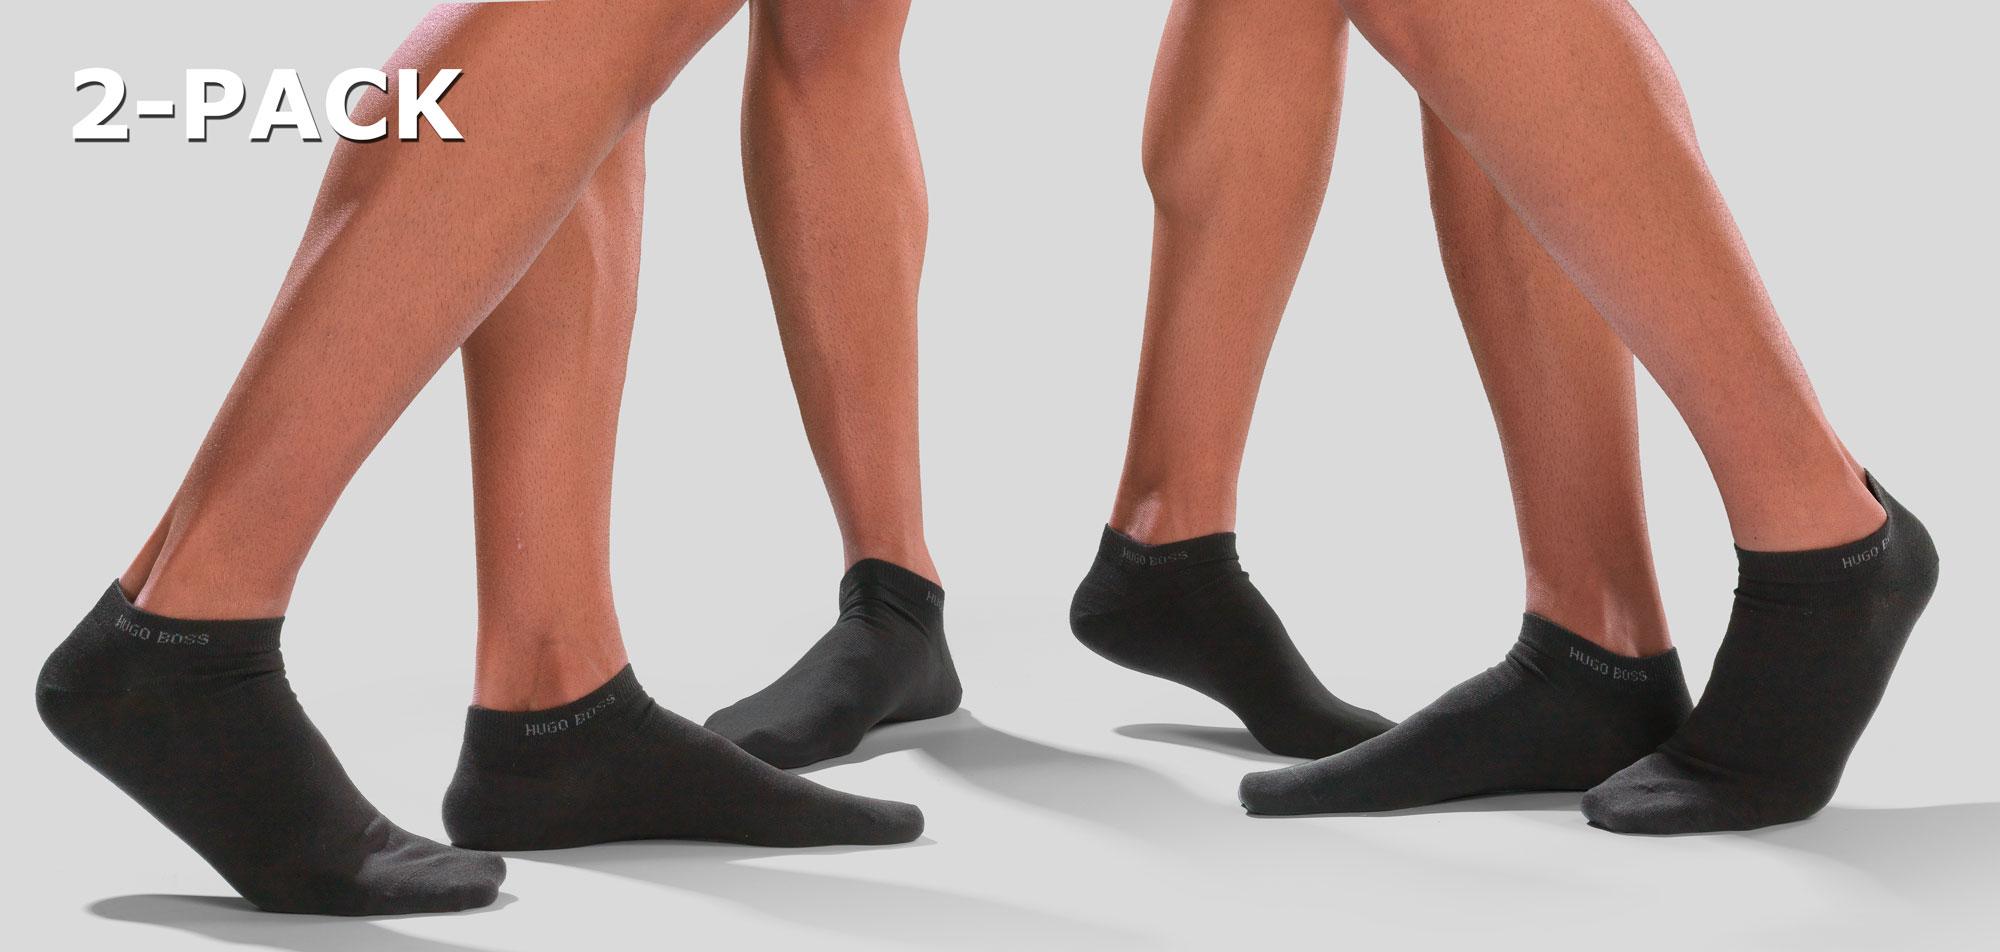 Boss AS Uni Socks 2-Pack 443-Wit (000)-L43-46